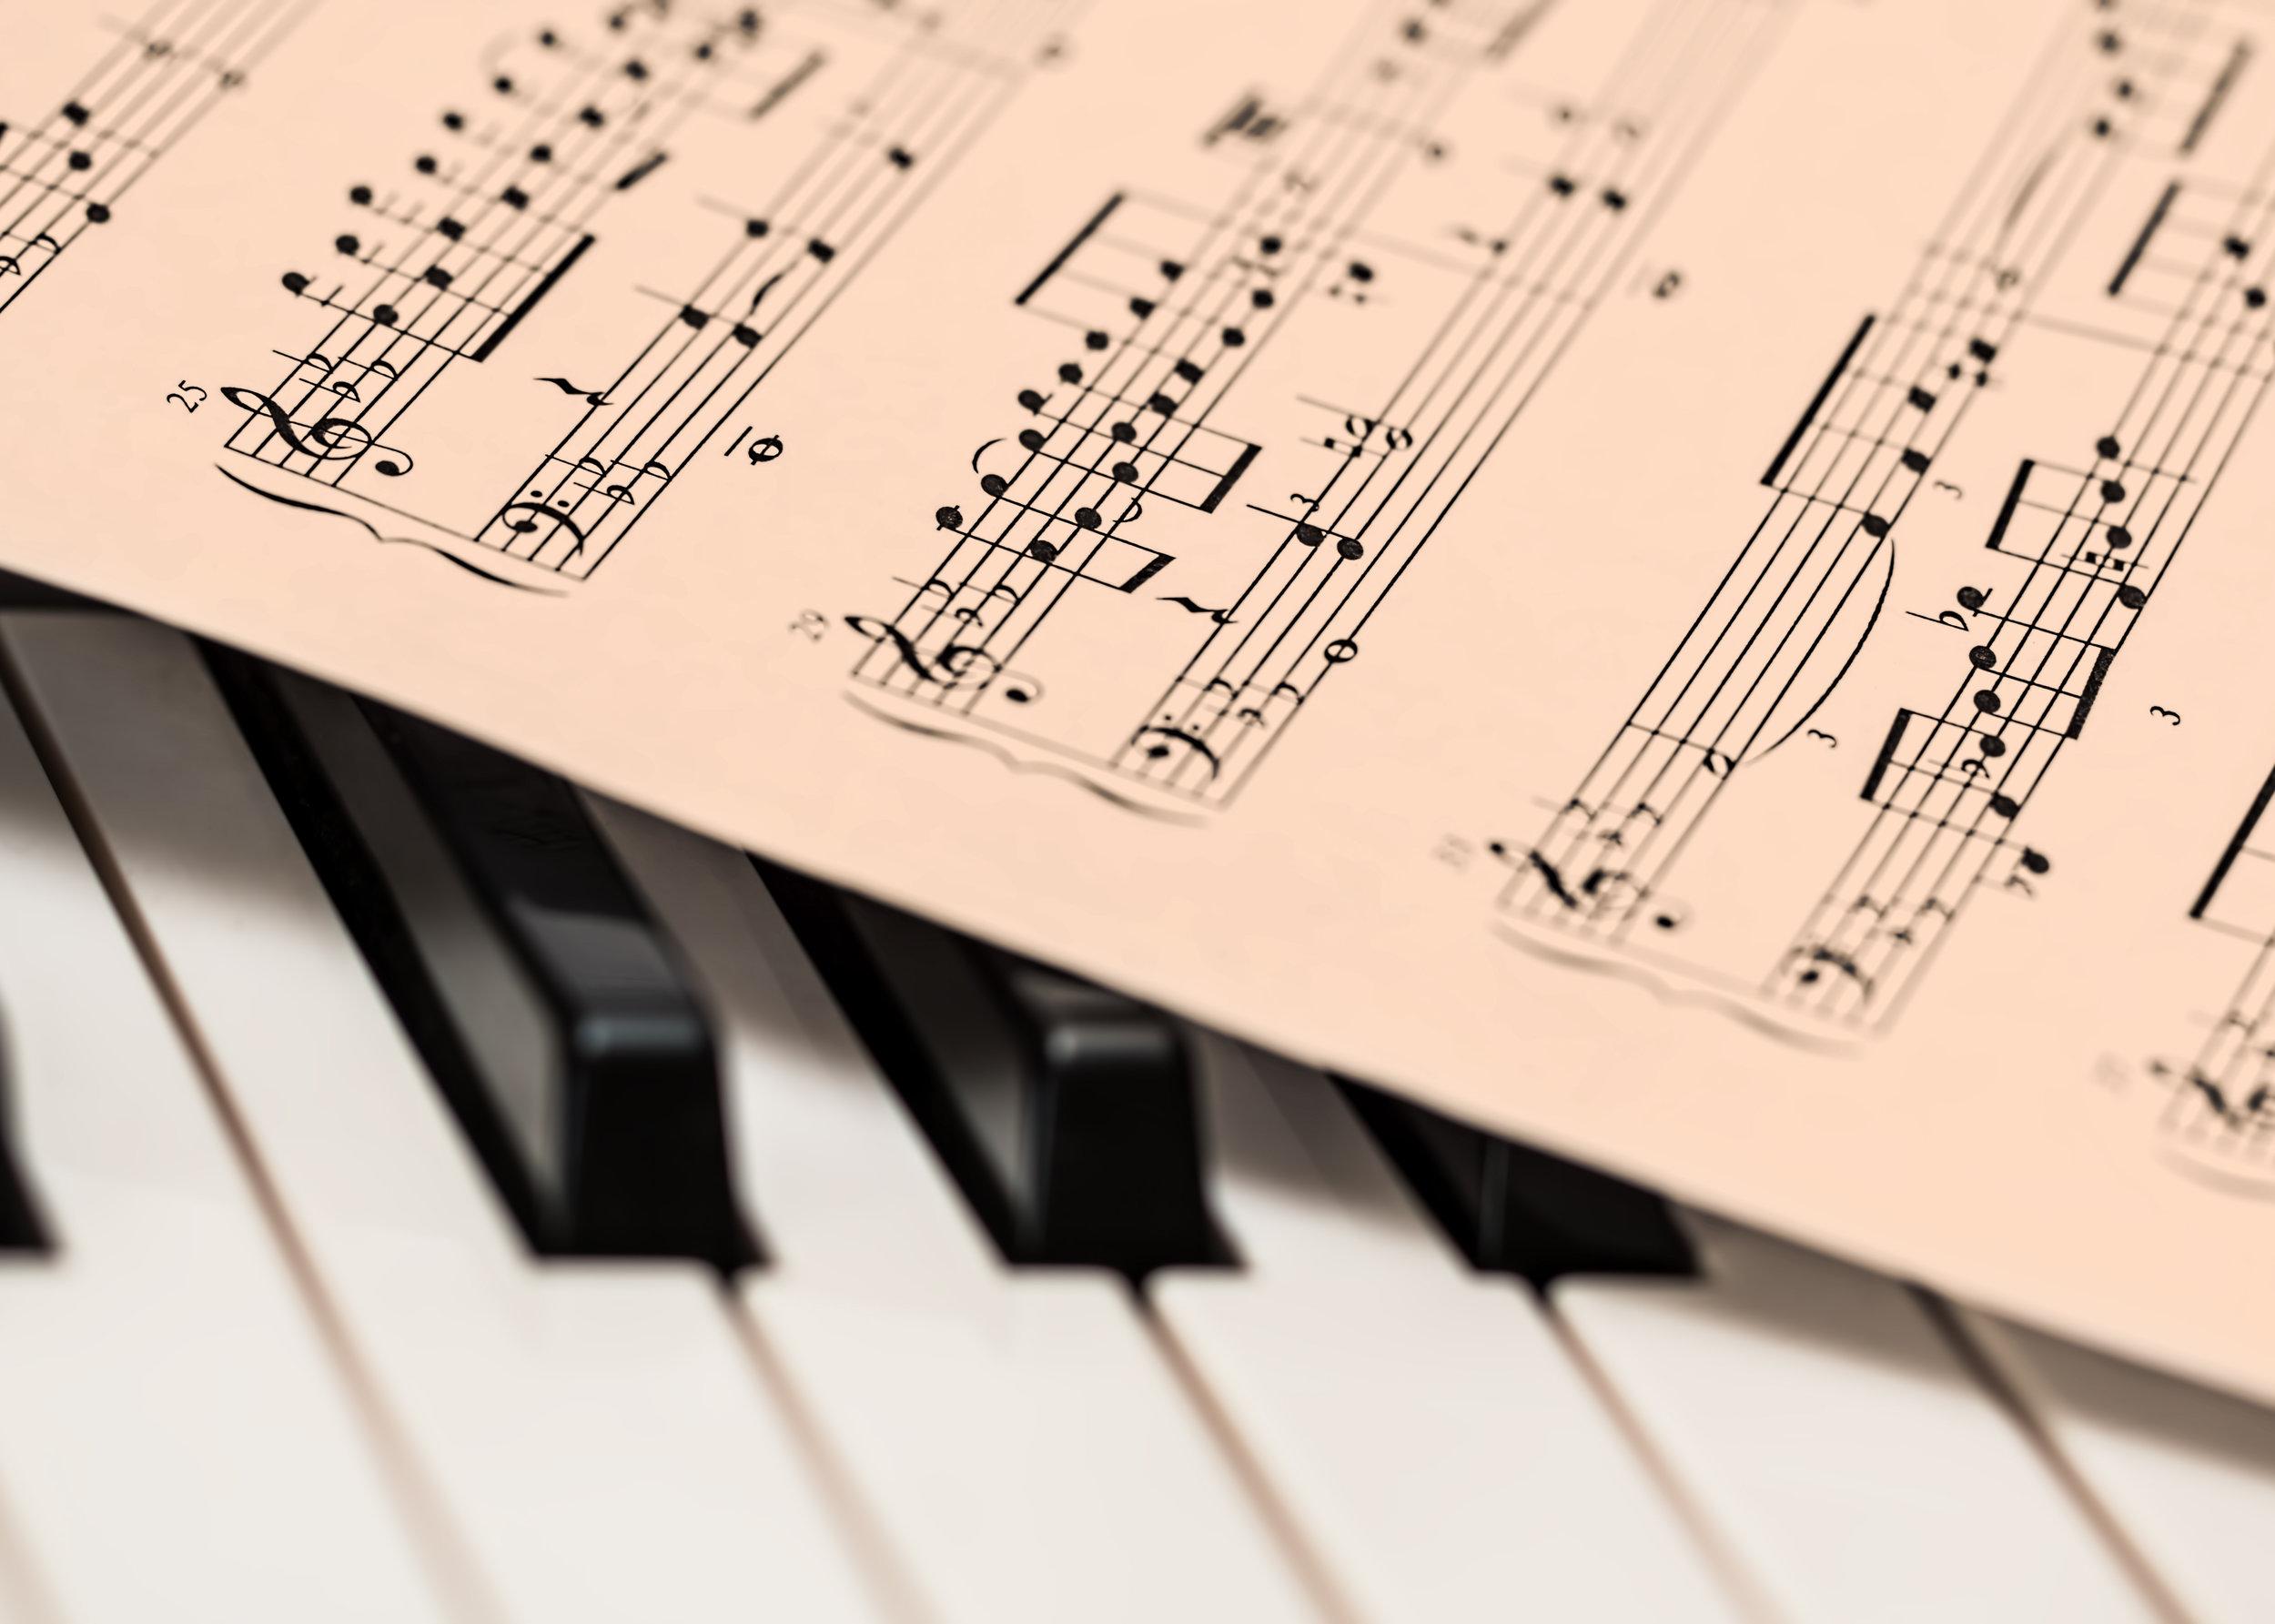 music-keyboard-instrument-piano-note-musical-instrument-496448-pxhere.com.jpg